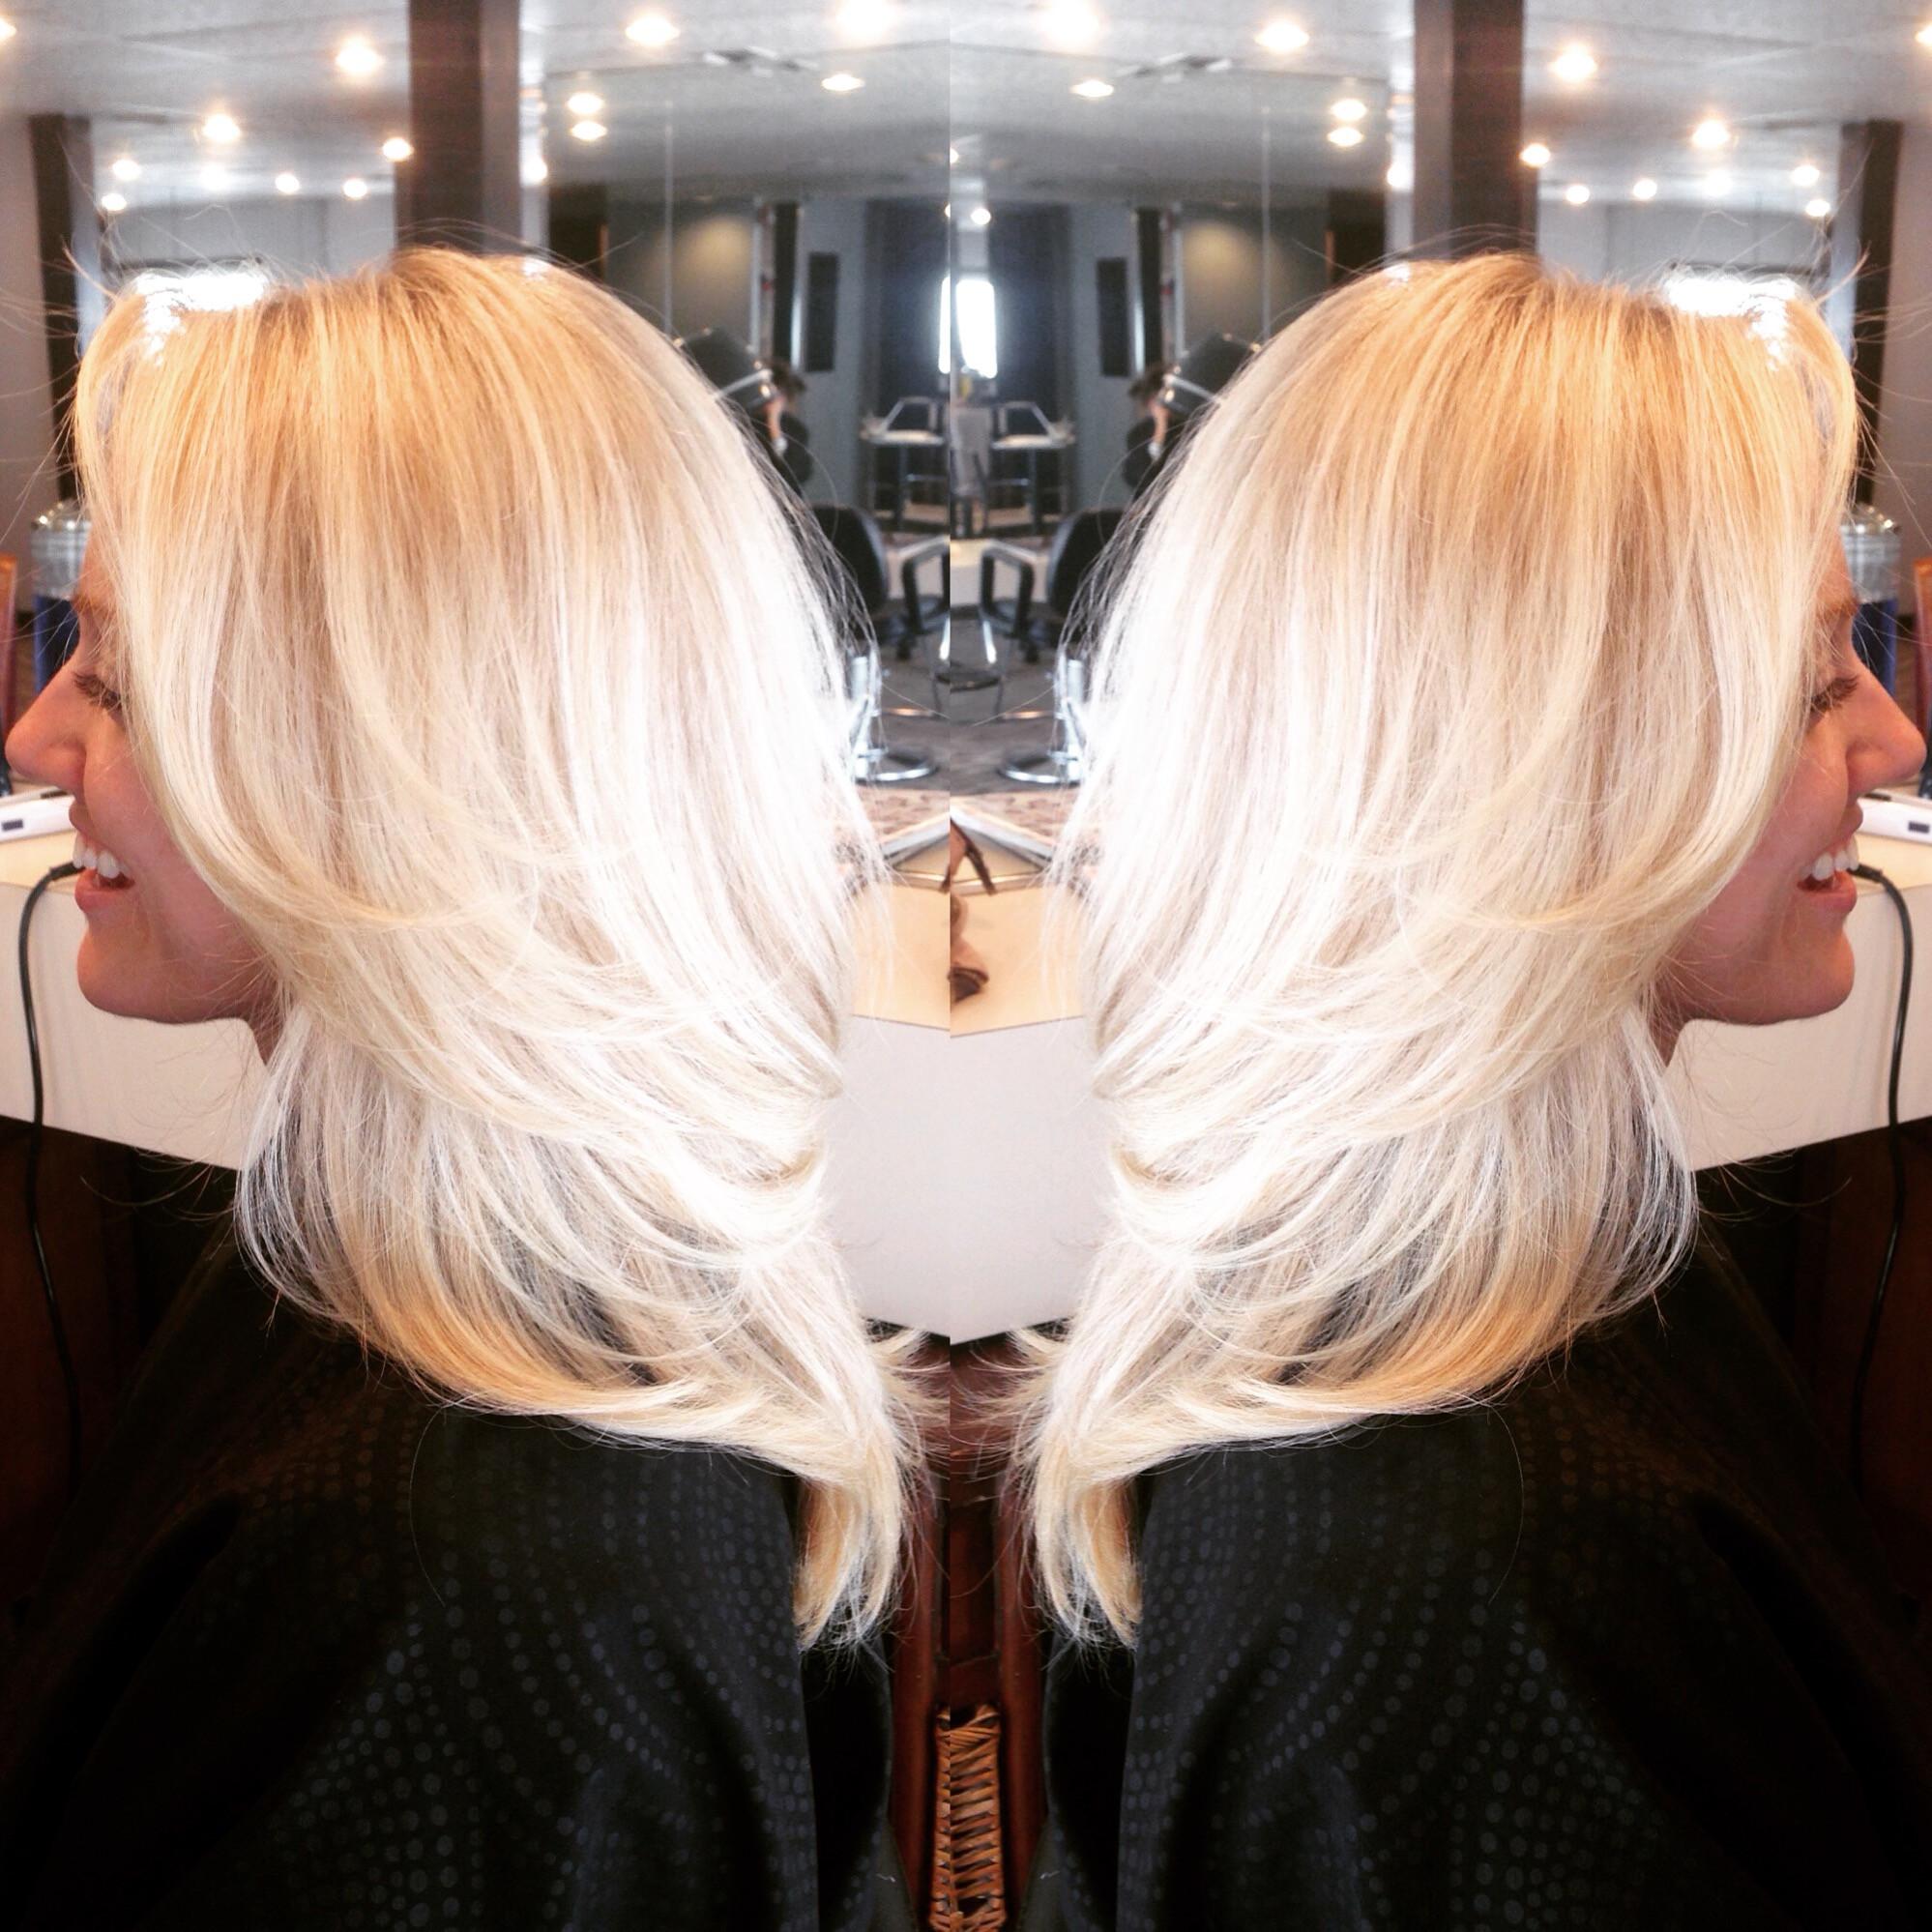 Double-process haircolor